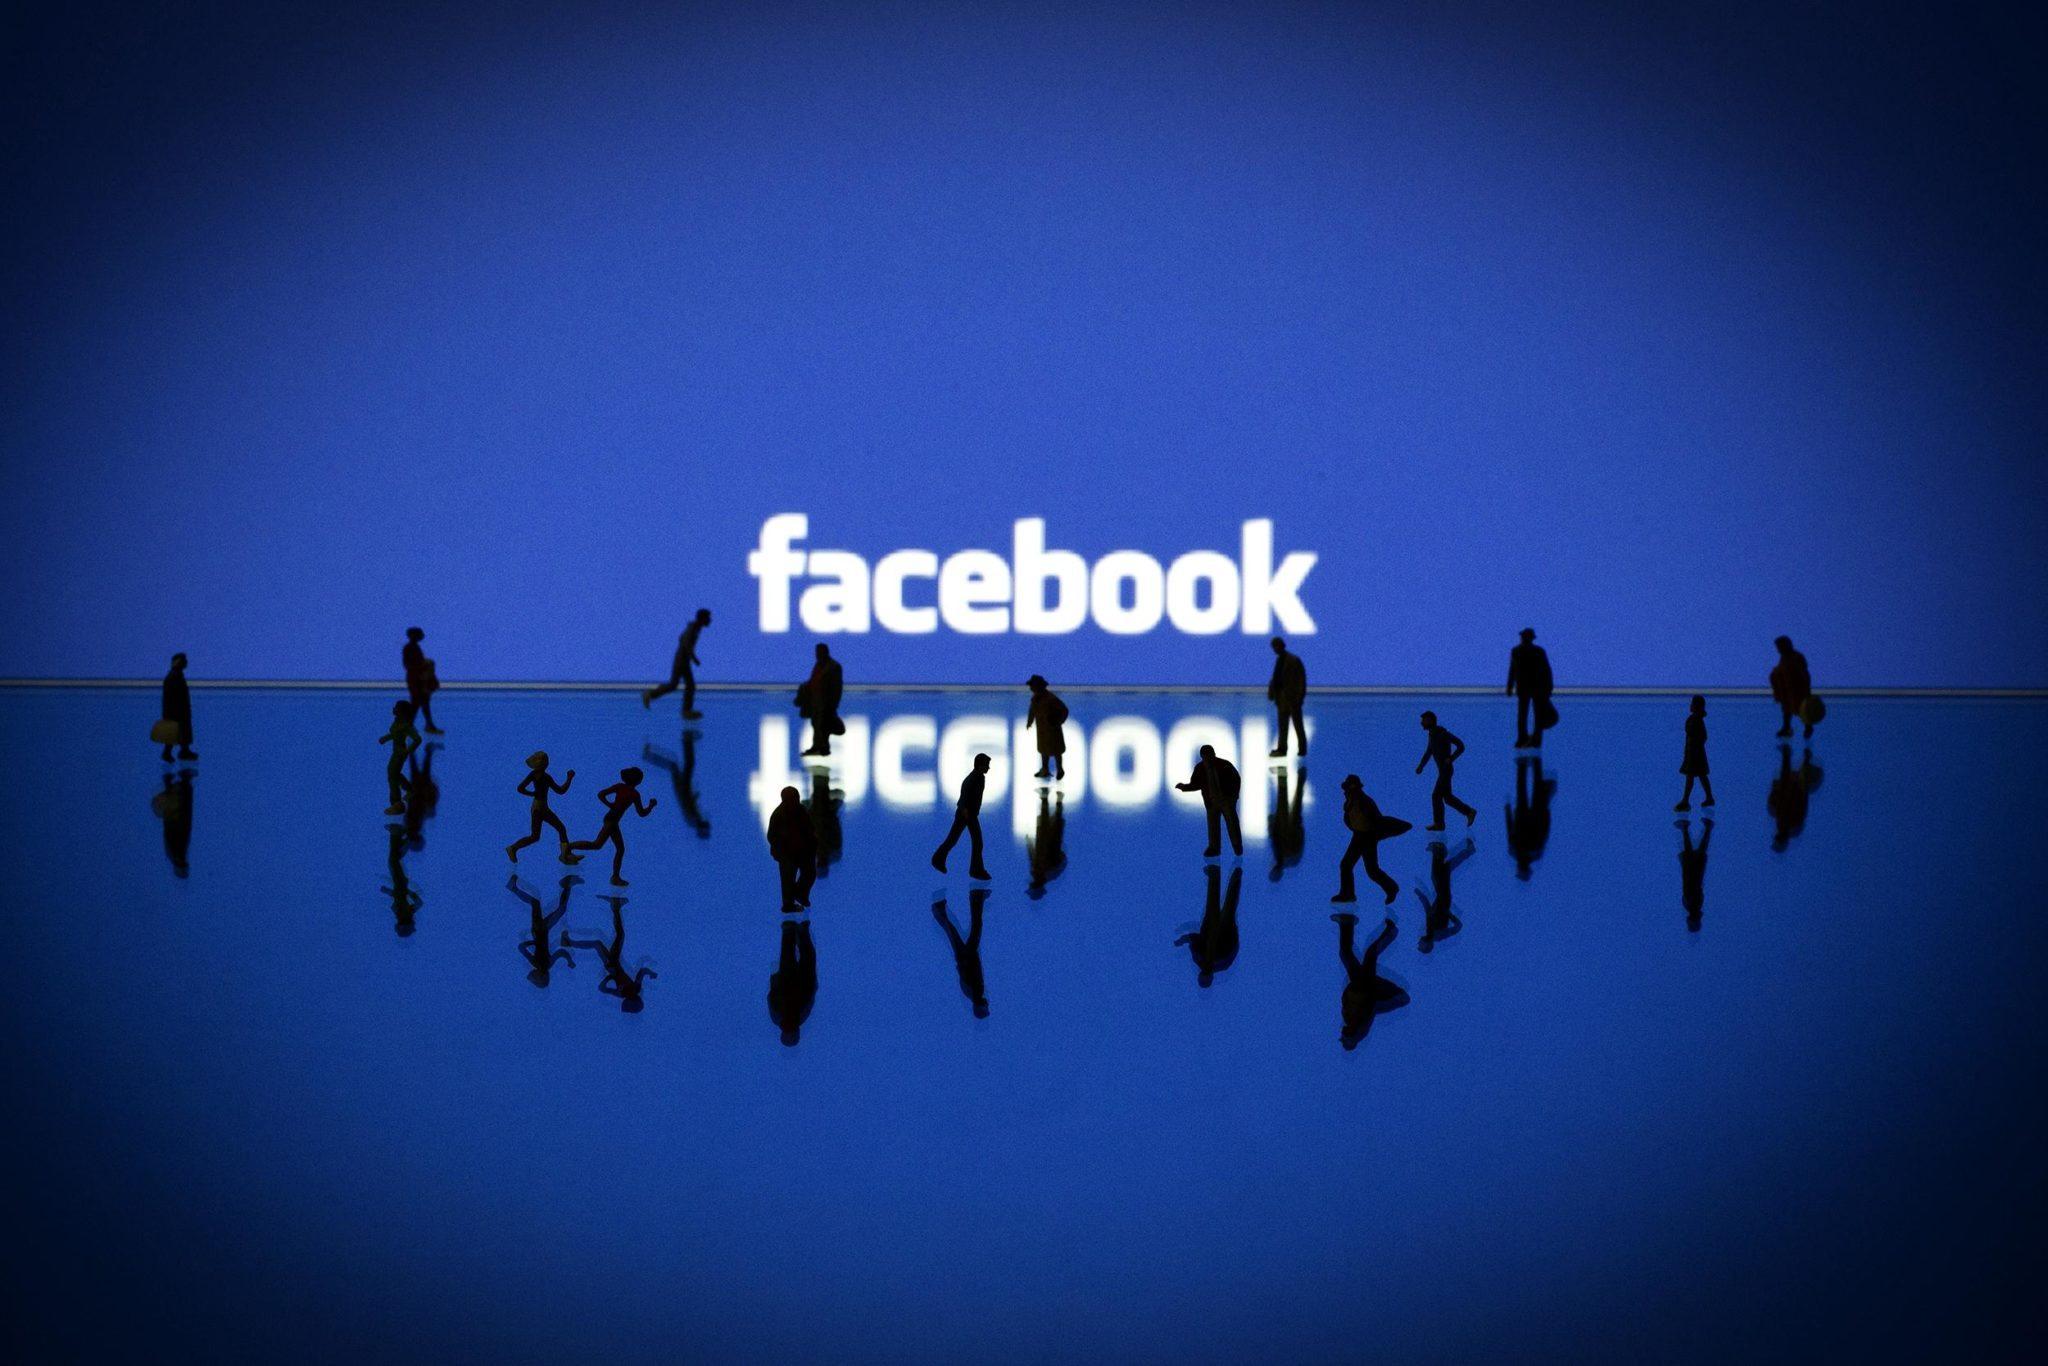 facebook in 2030 up